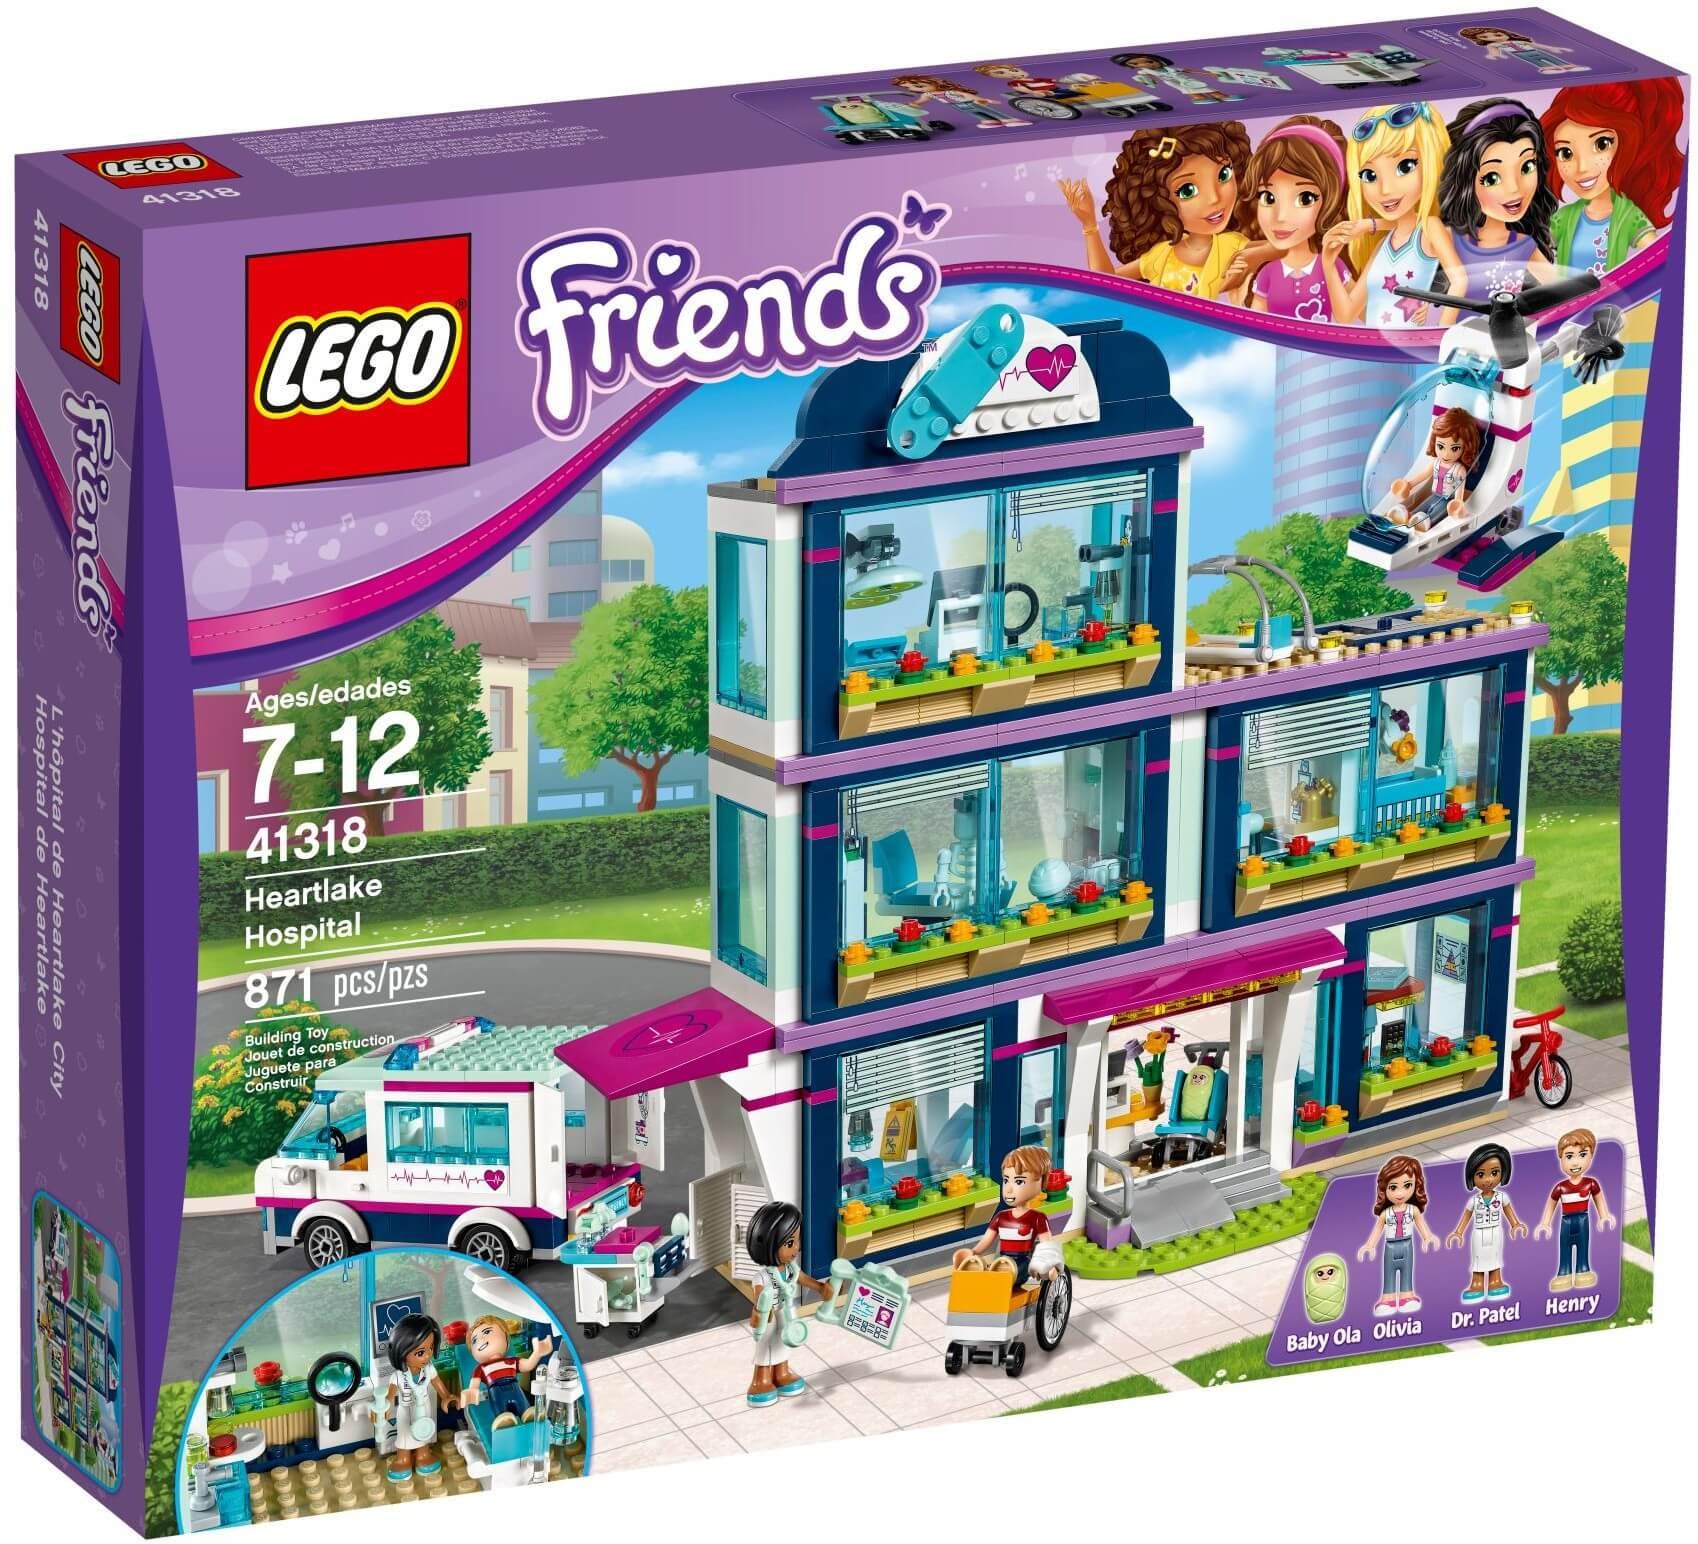 Mua đồ chơi LEGO 41318 - LEGO Friends 41318 - Bệnh Viện Heartlake (LEGO Friends Heartlake Hospital)